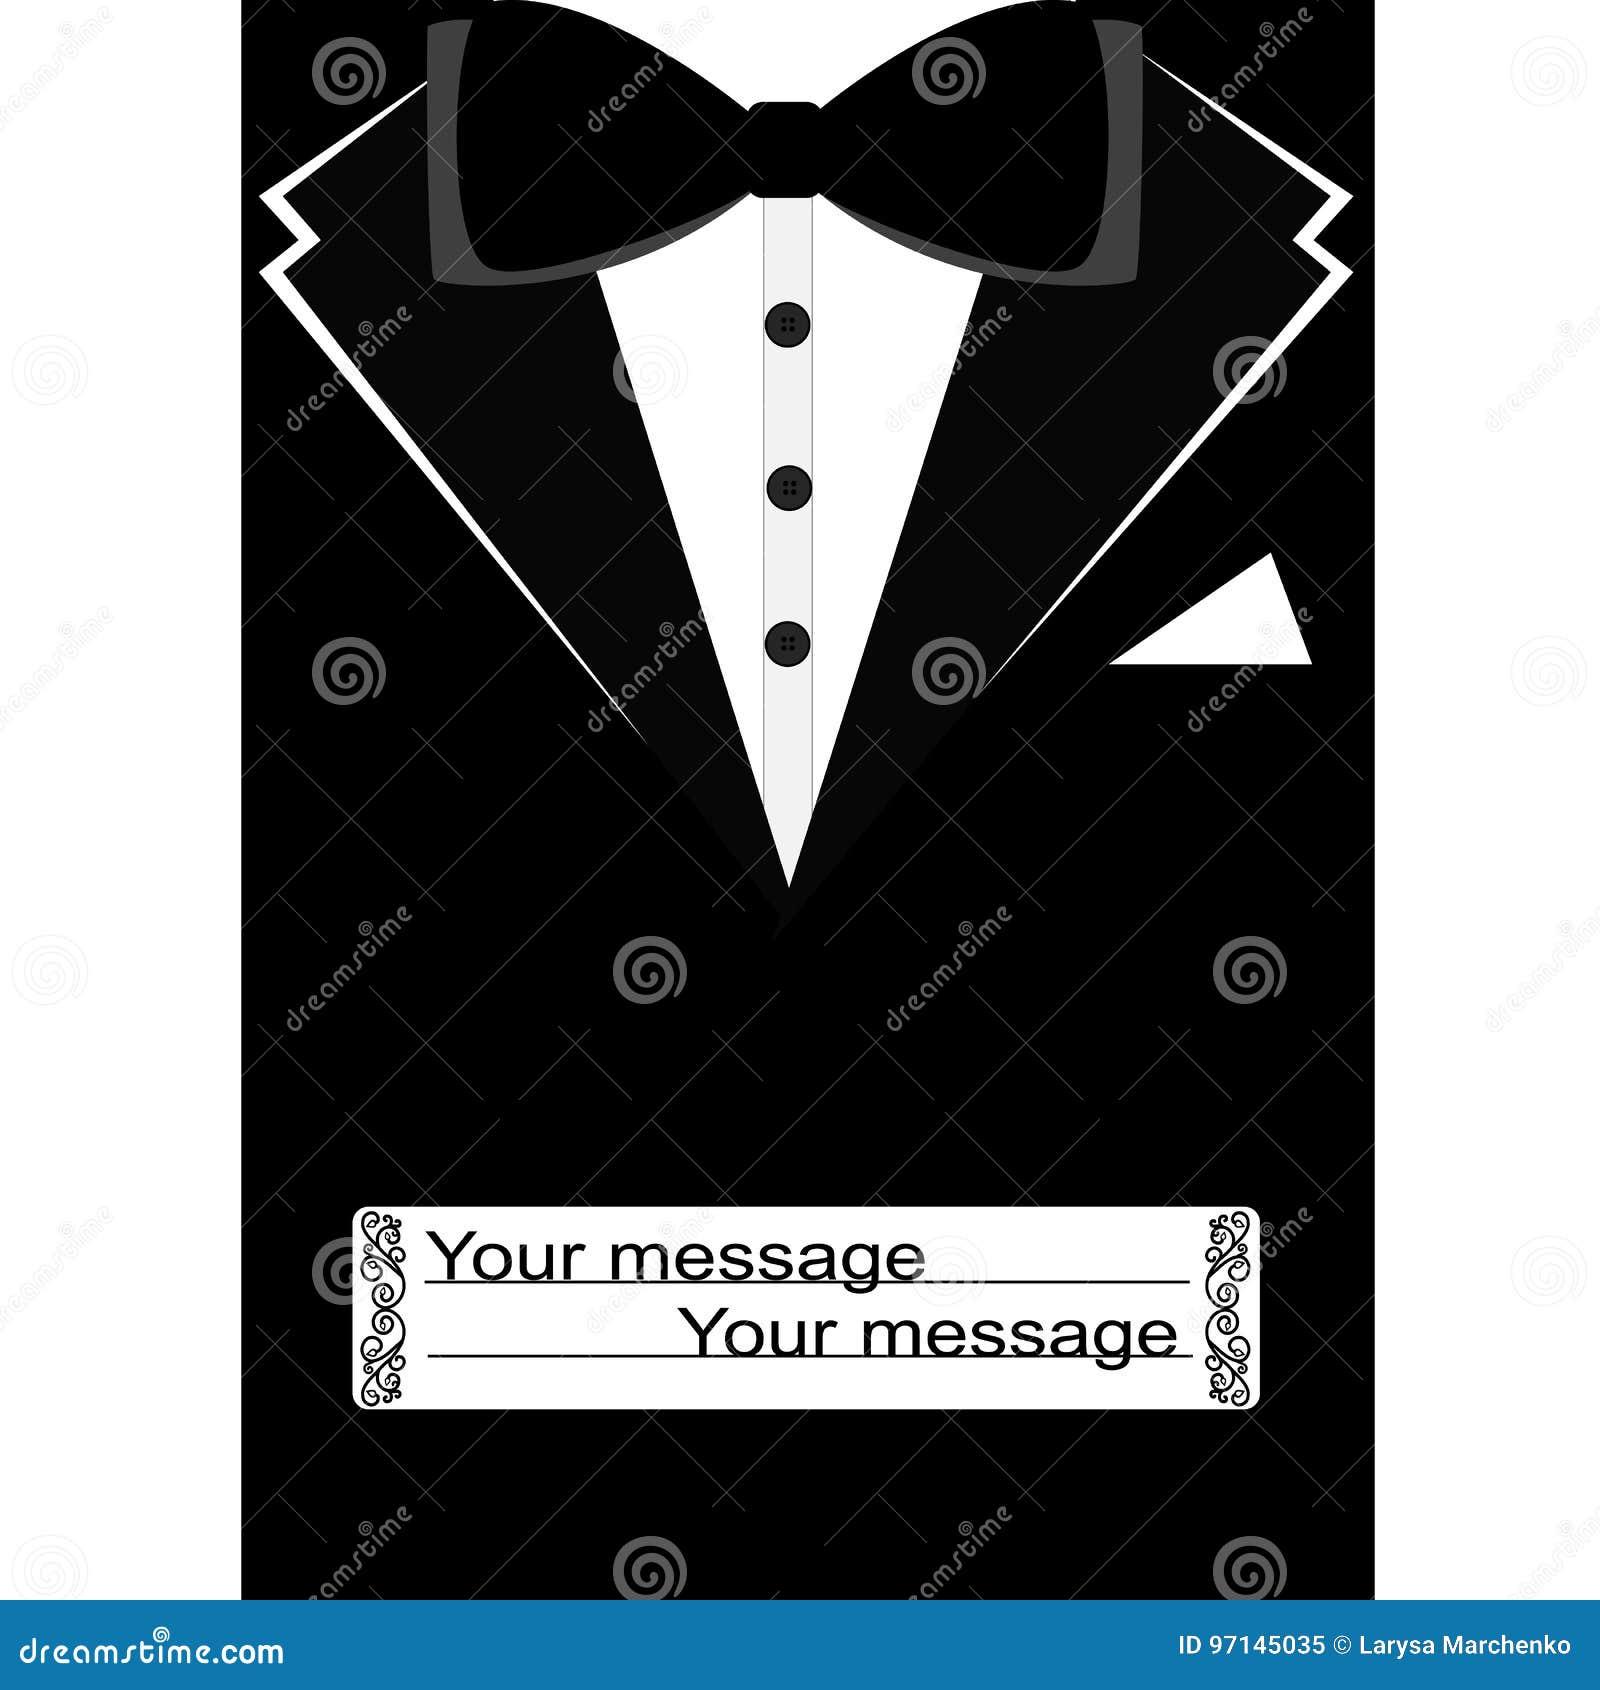 Postcard Tuxedo Black Suit With Bow Tie Stock Vector